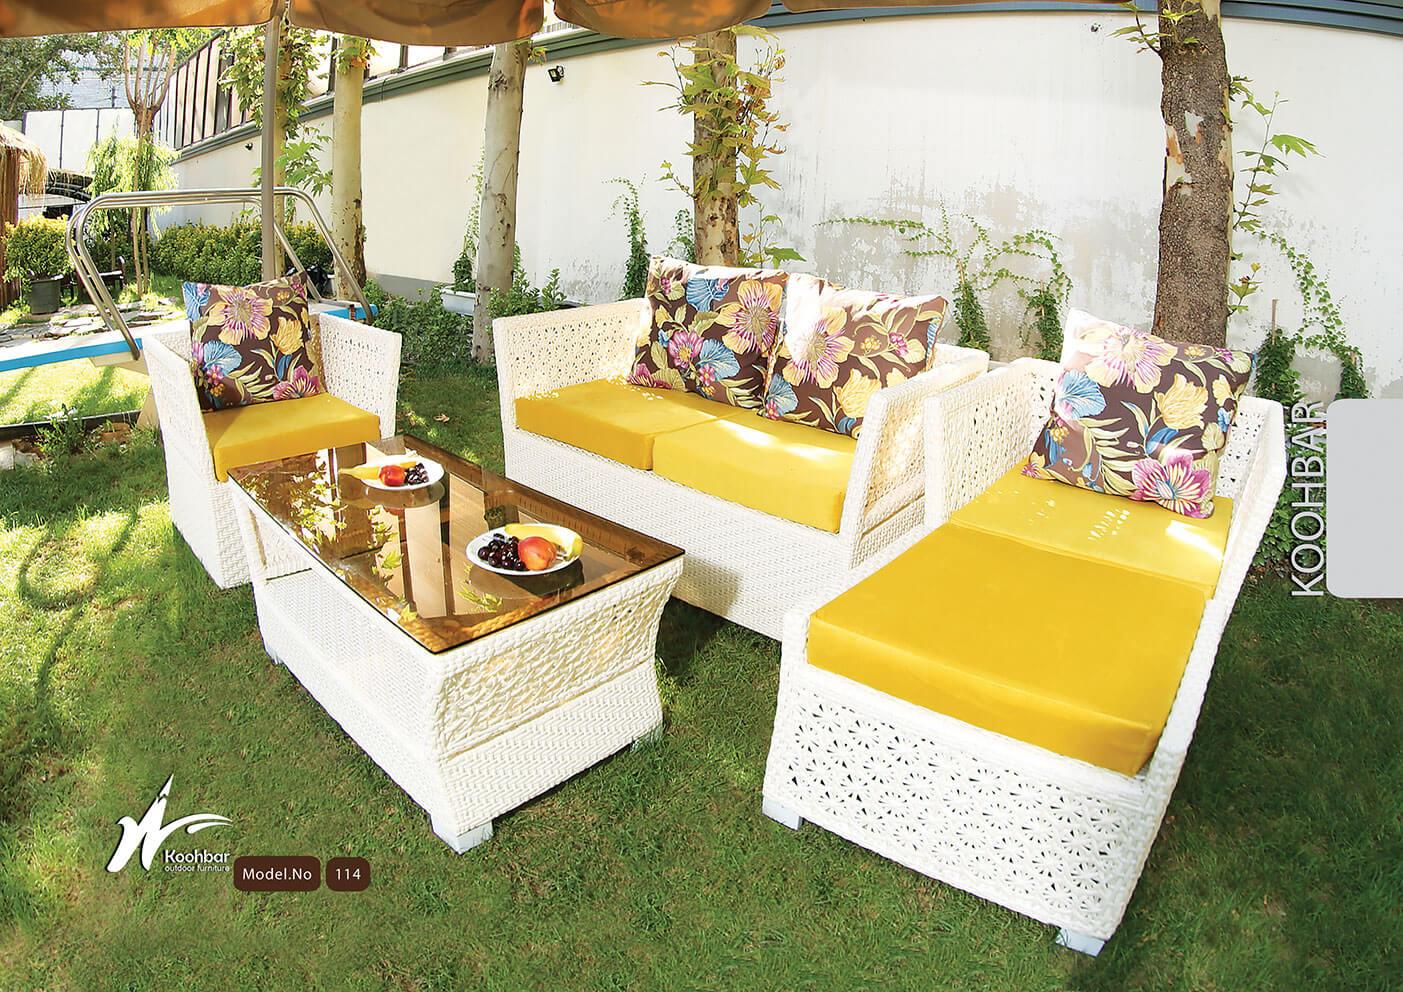 kohbar patio conversation sets 114 model0 - ست مبلمان حصیری حیاط کوهبر مدل ۱۱۴ - - patio-conversation-sets